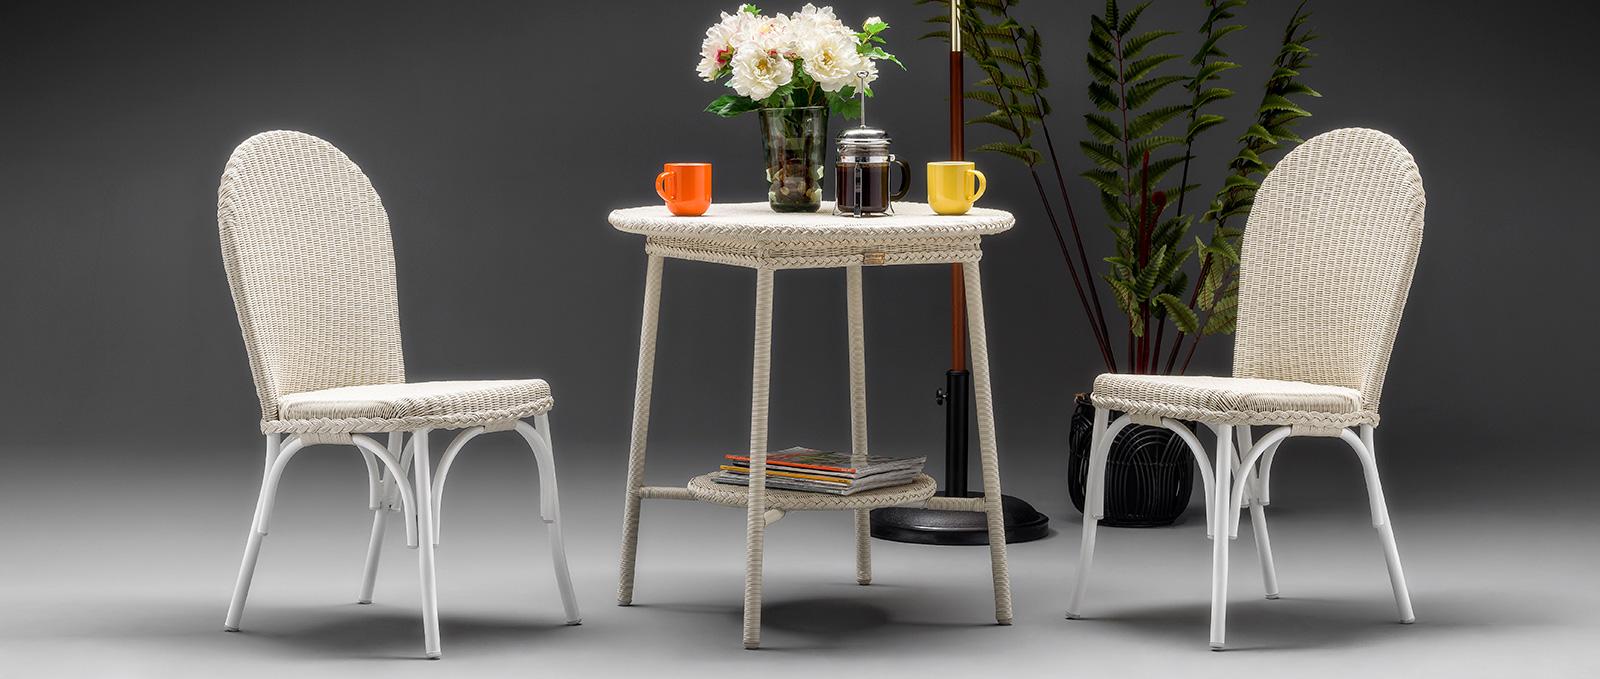 Lloyd Loom Bistro Outdoor Furniture Range - Blenheim Range - Crisp Linen